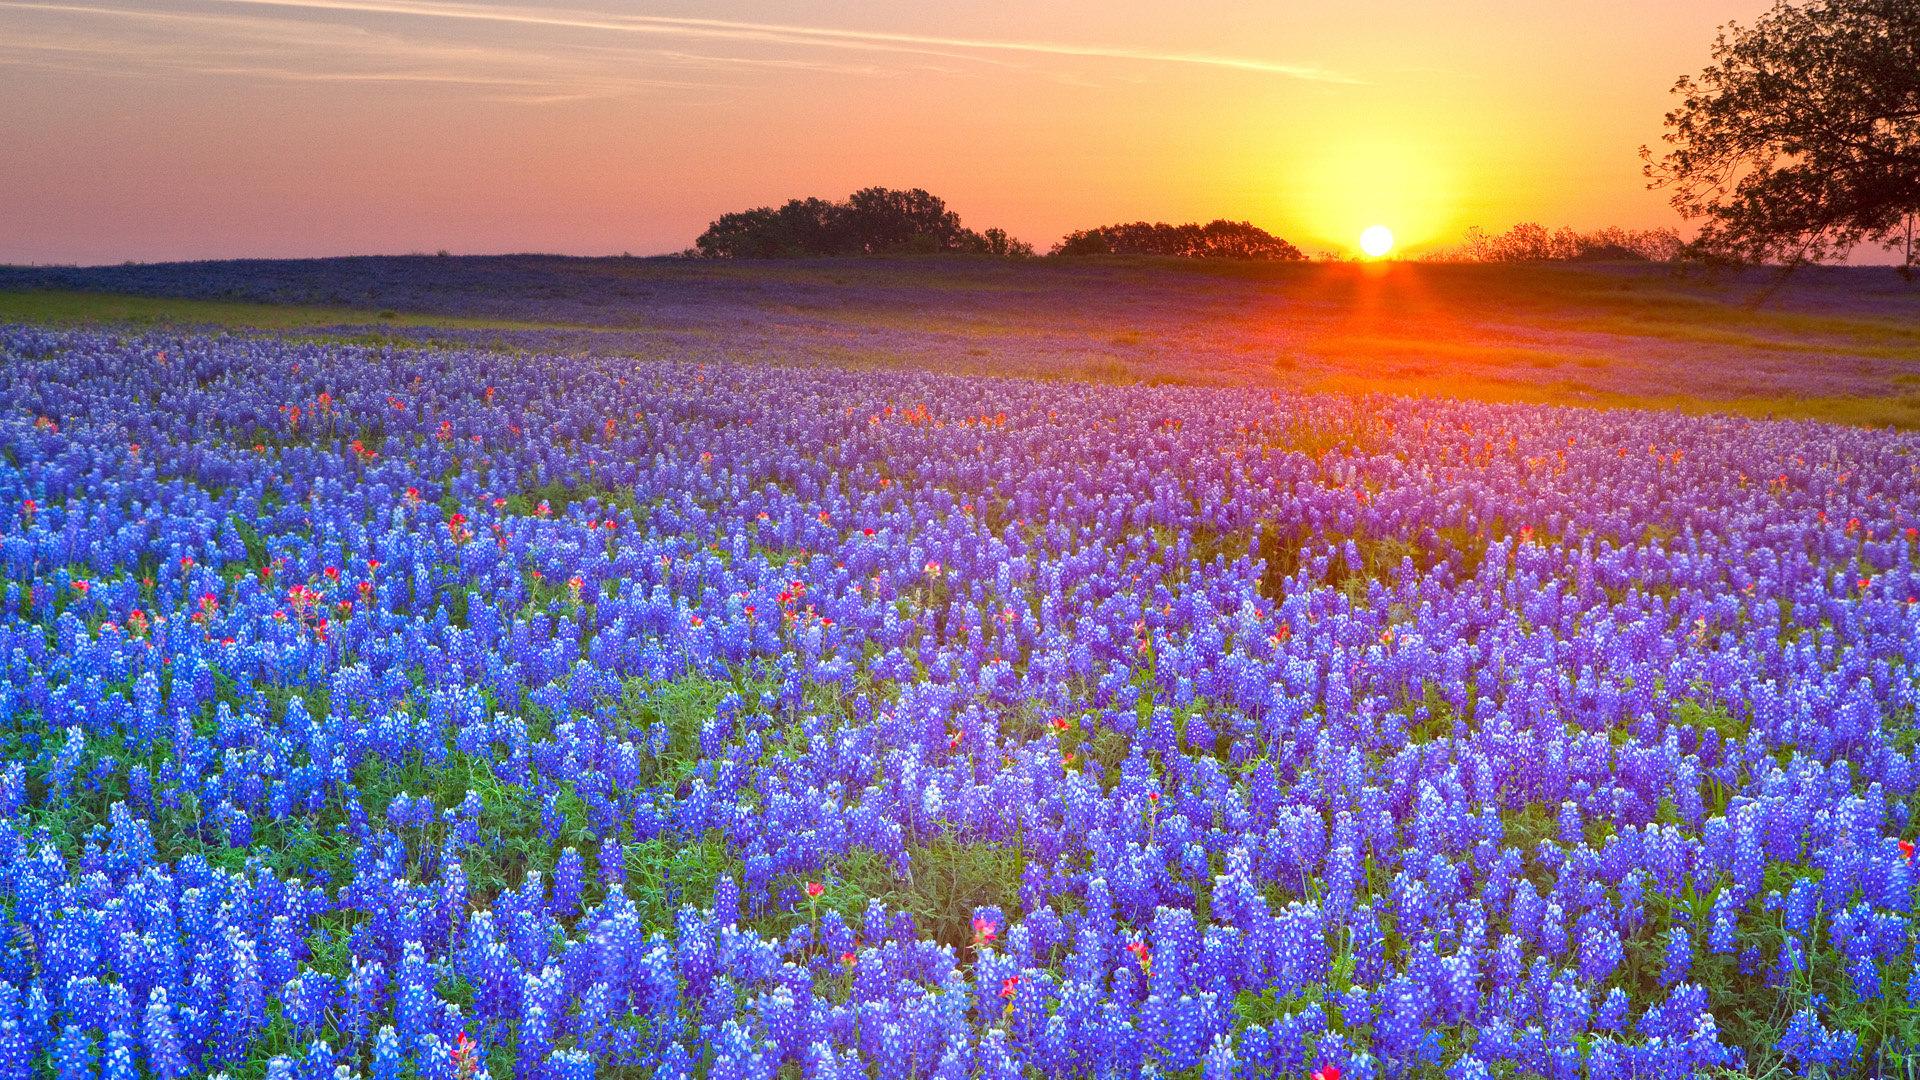 Texas Landscape Wallpaper